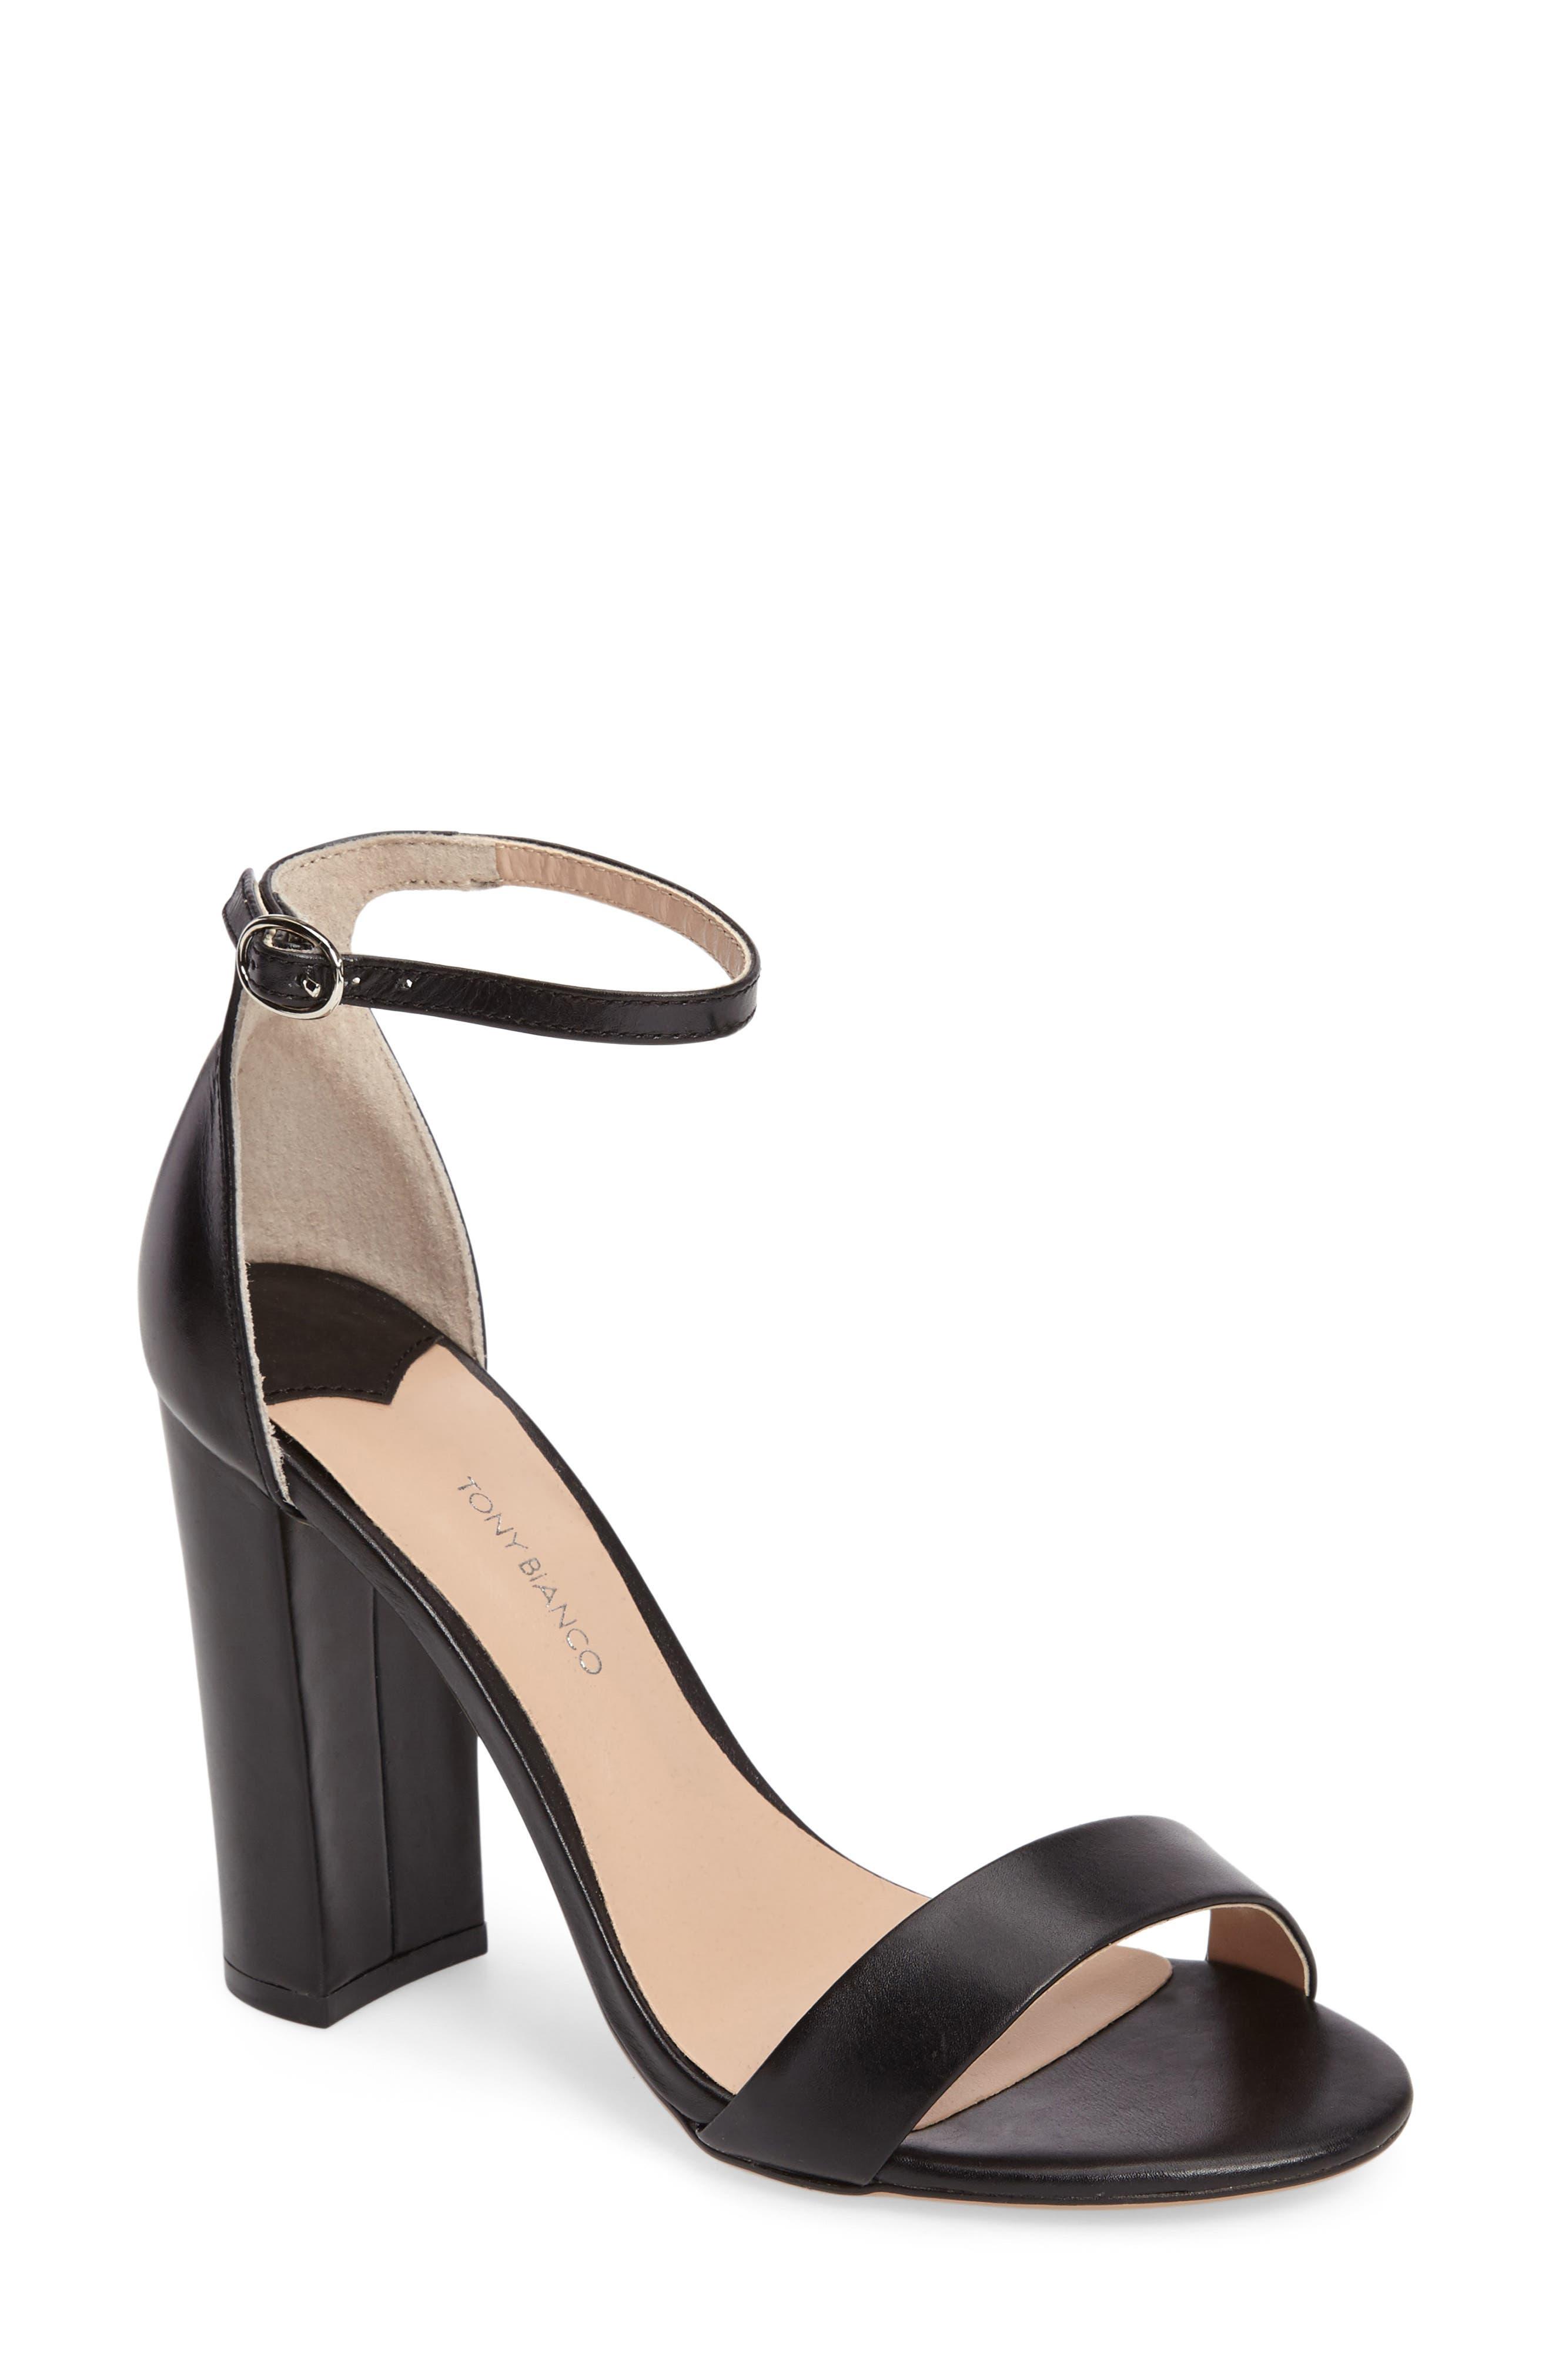 Main Image - Tony Bianco Kokomo Strappy Sandal (Women)